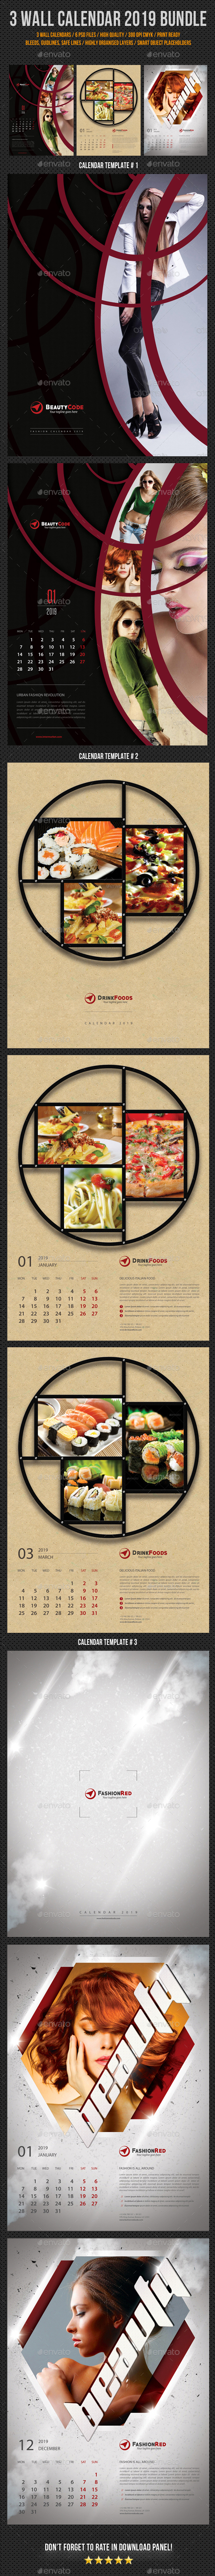 Wall Calendar 2019 Bundle V09 - Calendars Stationery